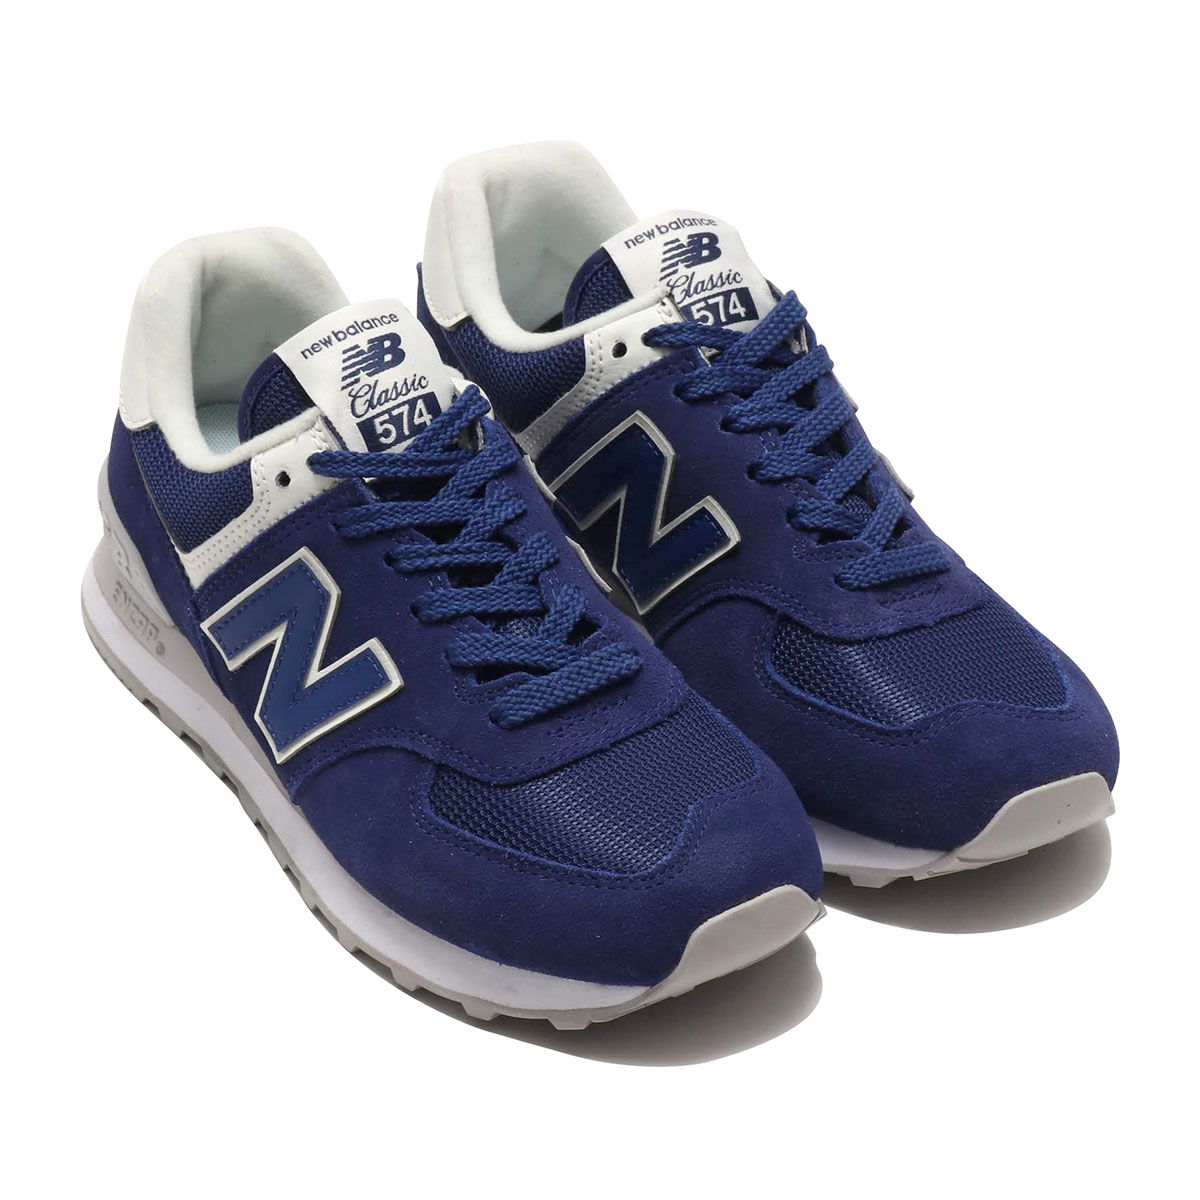 New Balance WL574WEA(ニューバランス WL574WEA)BLUE【レディース スニーカー】19FW-I